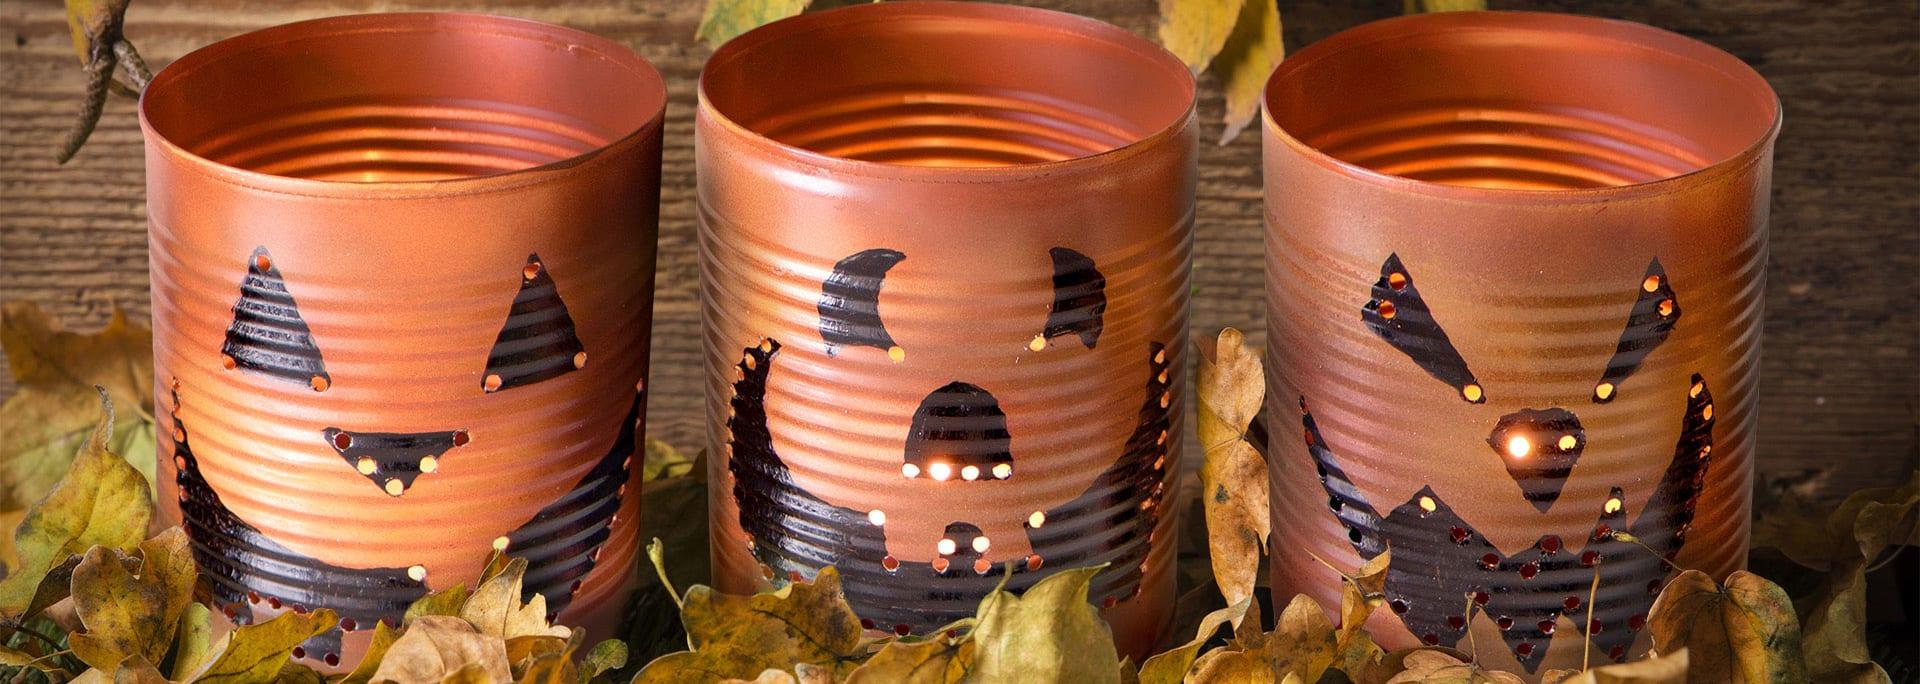 La boîte d'Halloween